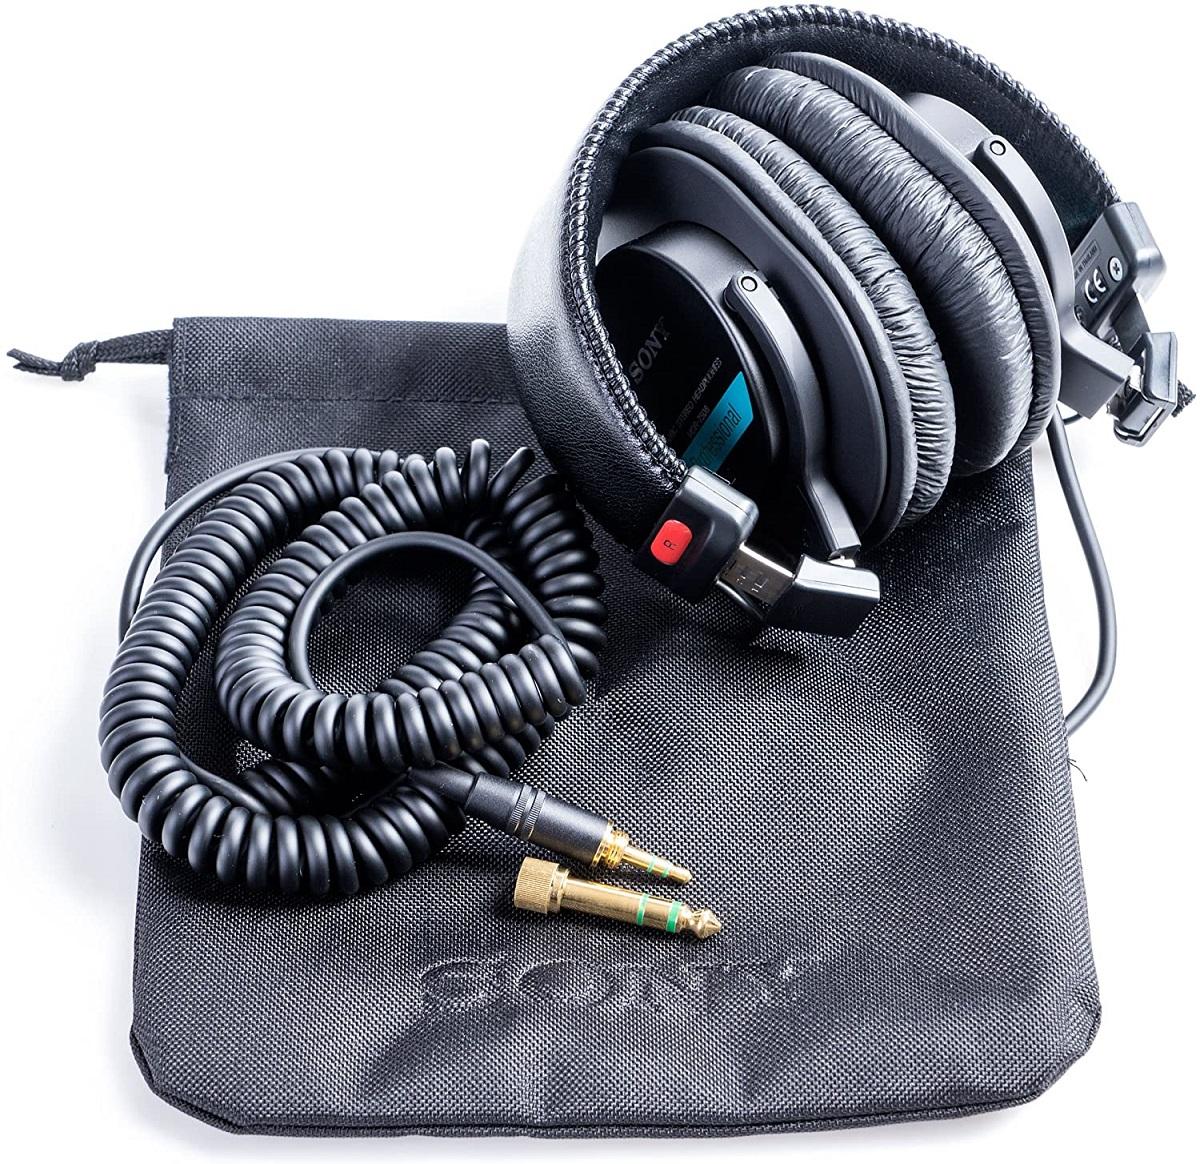 SONY MDR-7506 CUFFIA DA STUDIO E DJ CHIUSA CIRCUMAURALE 2